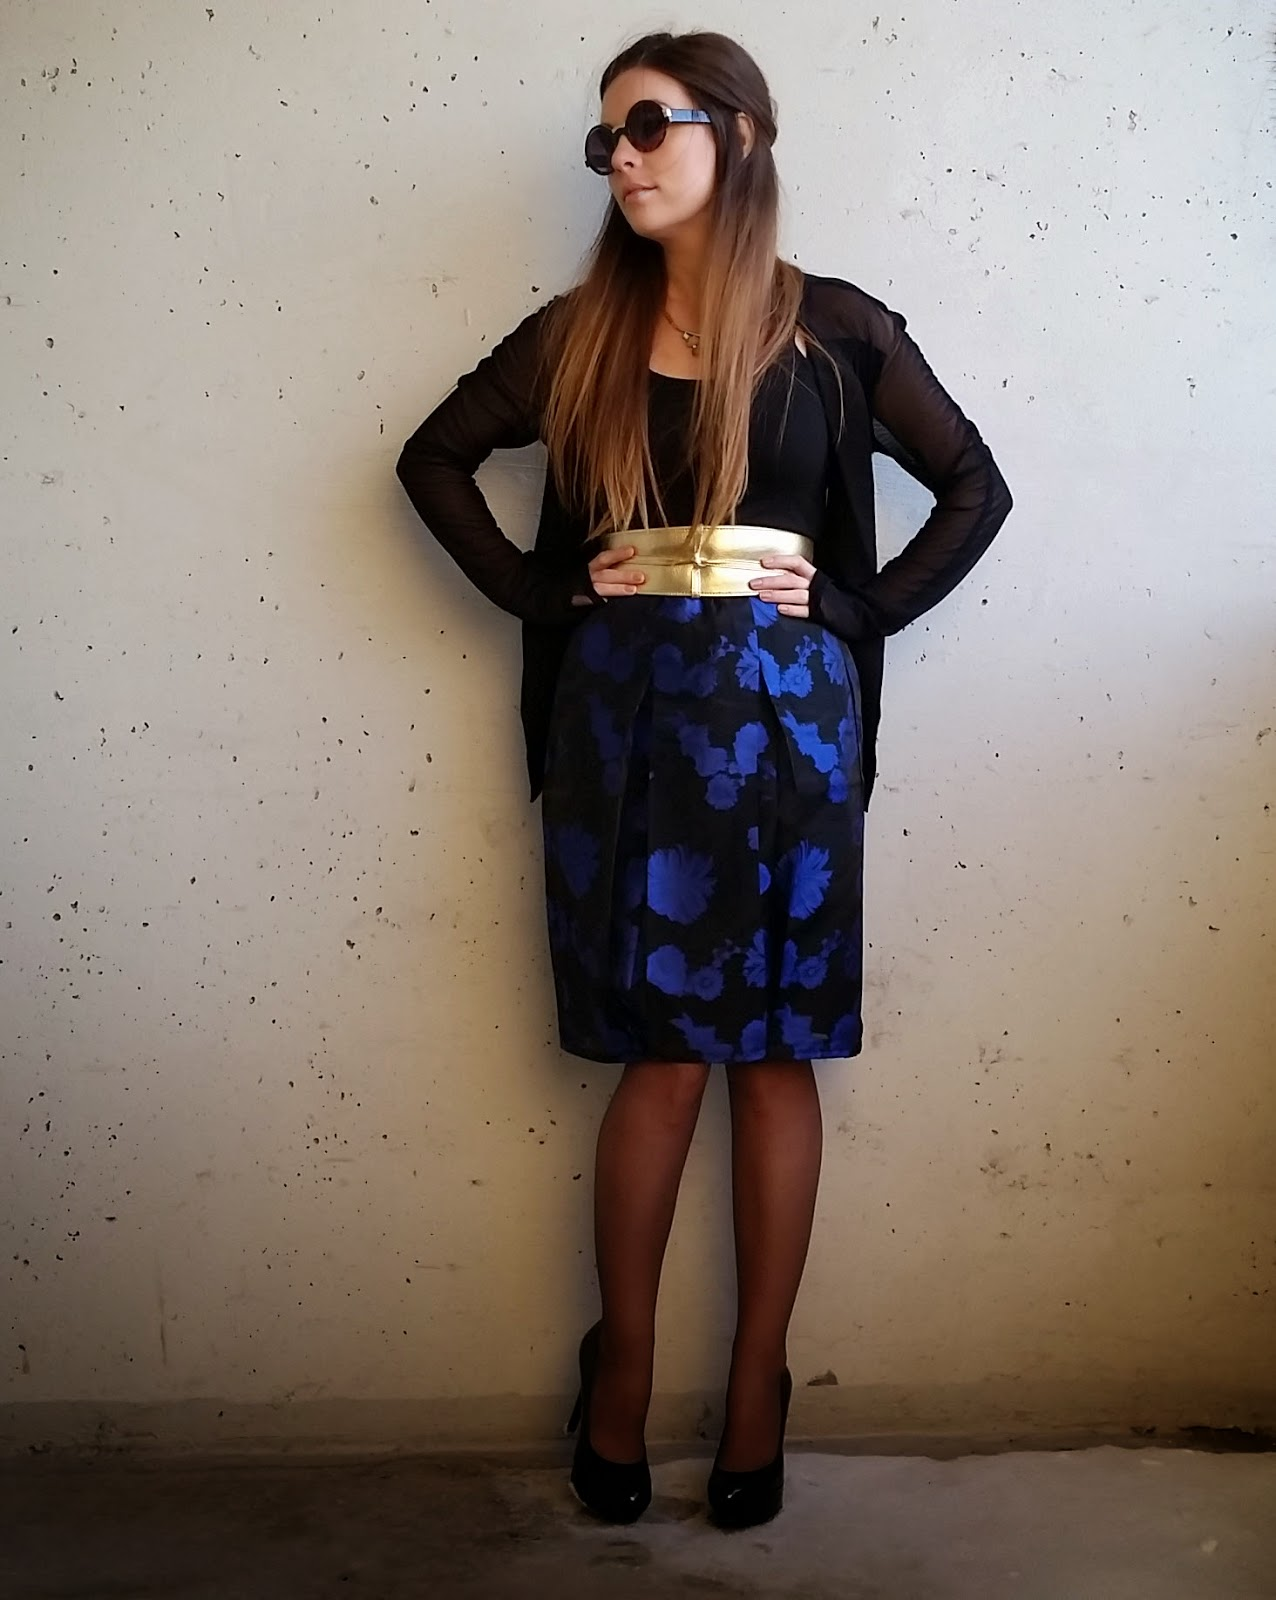 gold belt, royal blue skit and sheer pantyhose